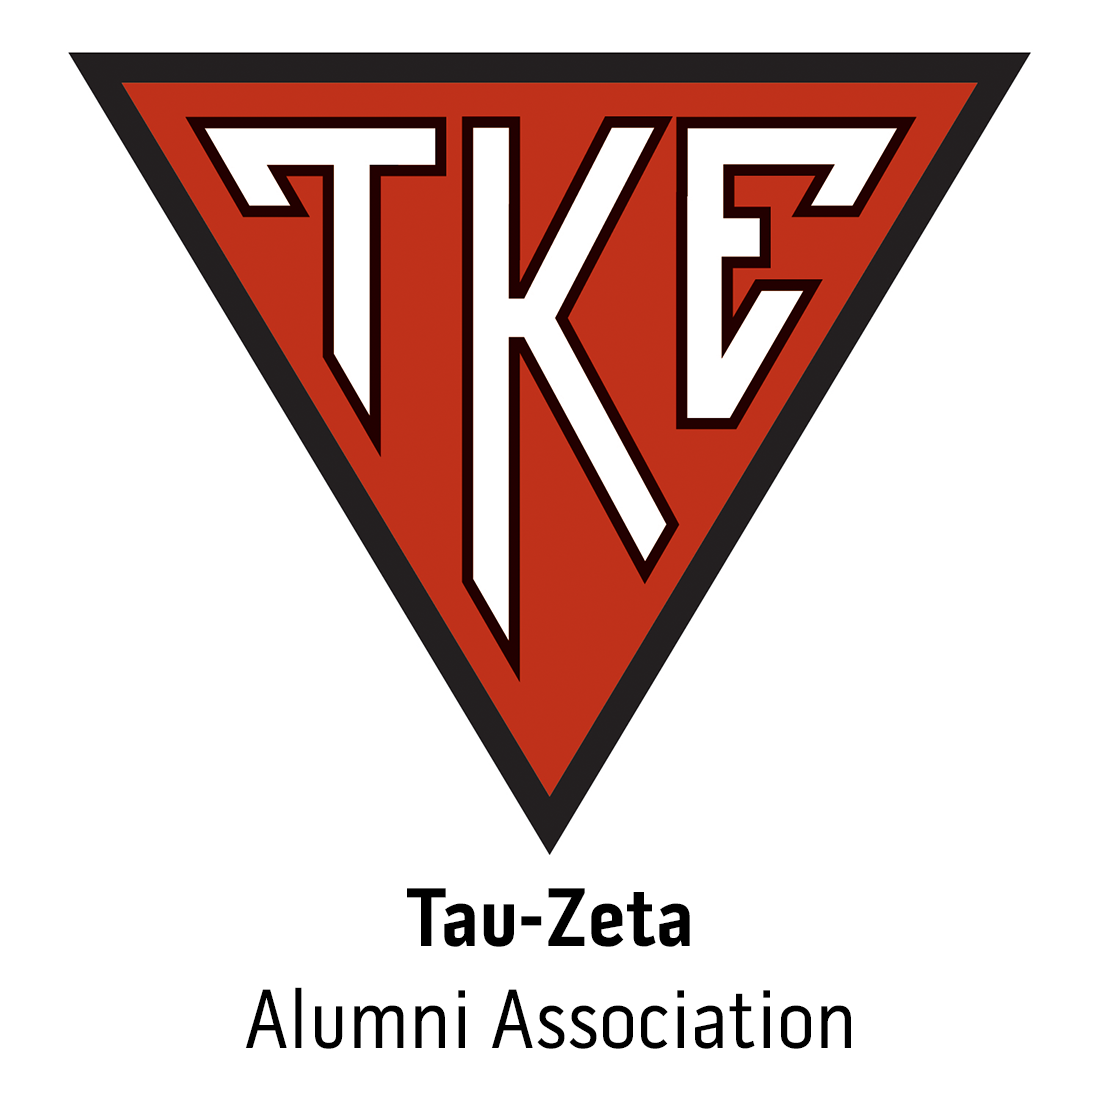 Tau-Zeta Alumni Association for Western Connecticut State University